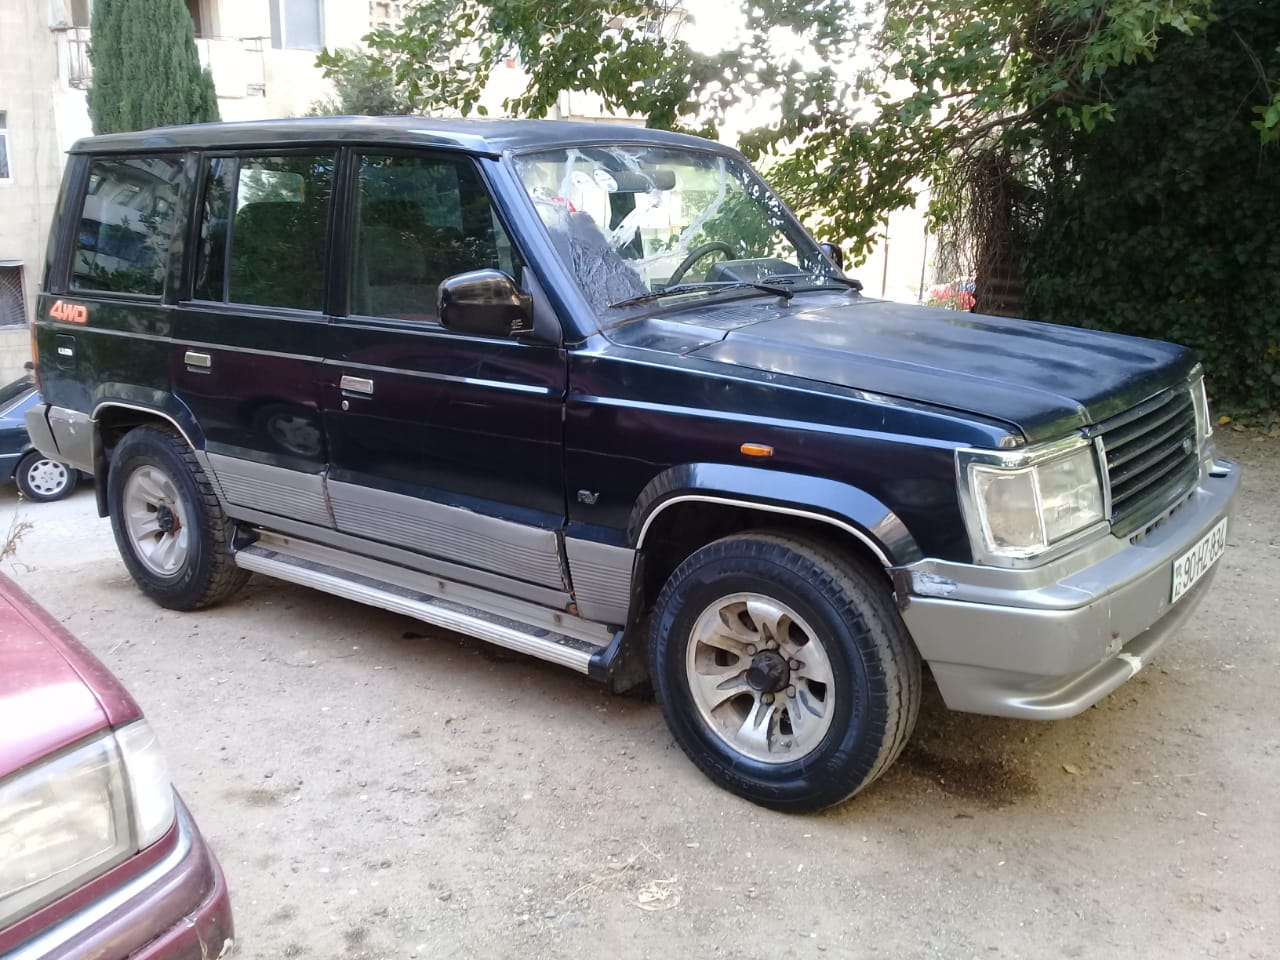 Hyundai Galloper 2.5(lt) 1996 Подержанный  $2950